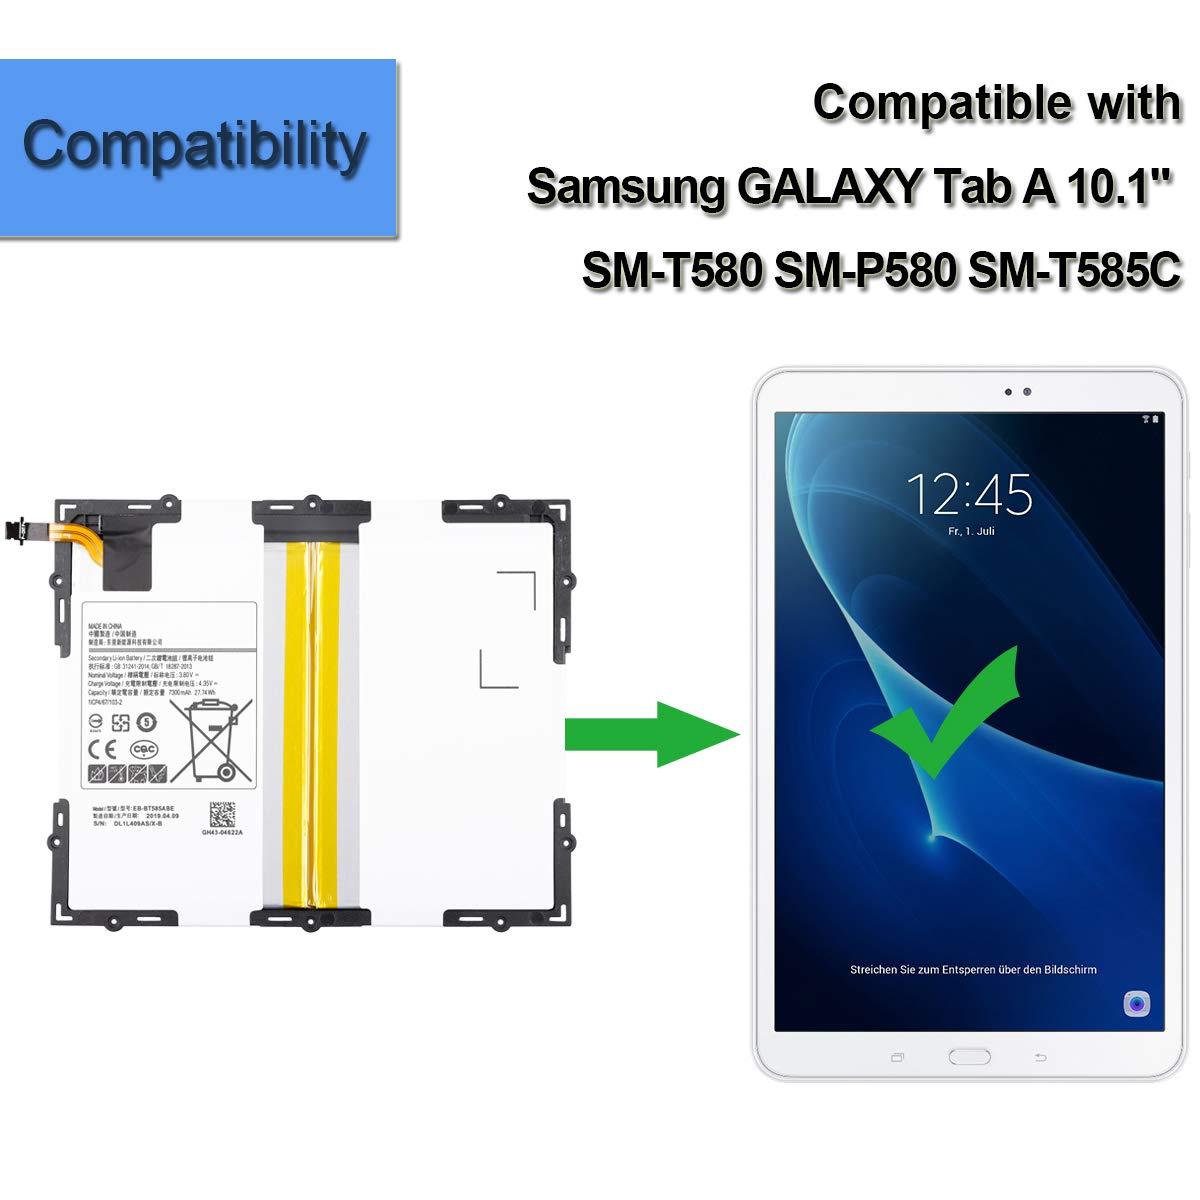 Tools Neuer Ersatzakku EB-BT585ABA EB-BT585ABE Kompatibel mit Samsung Galaxy Tab A 10.1 2016 TD-LTE SM-P580 SM-P585M SM-T580